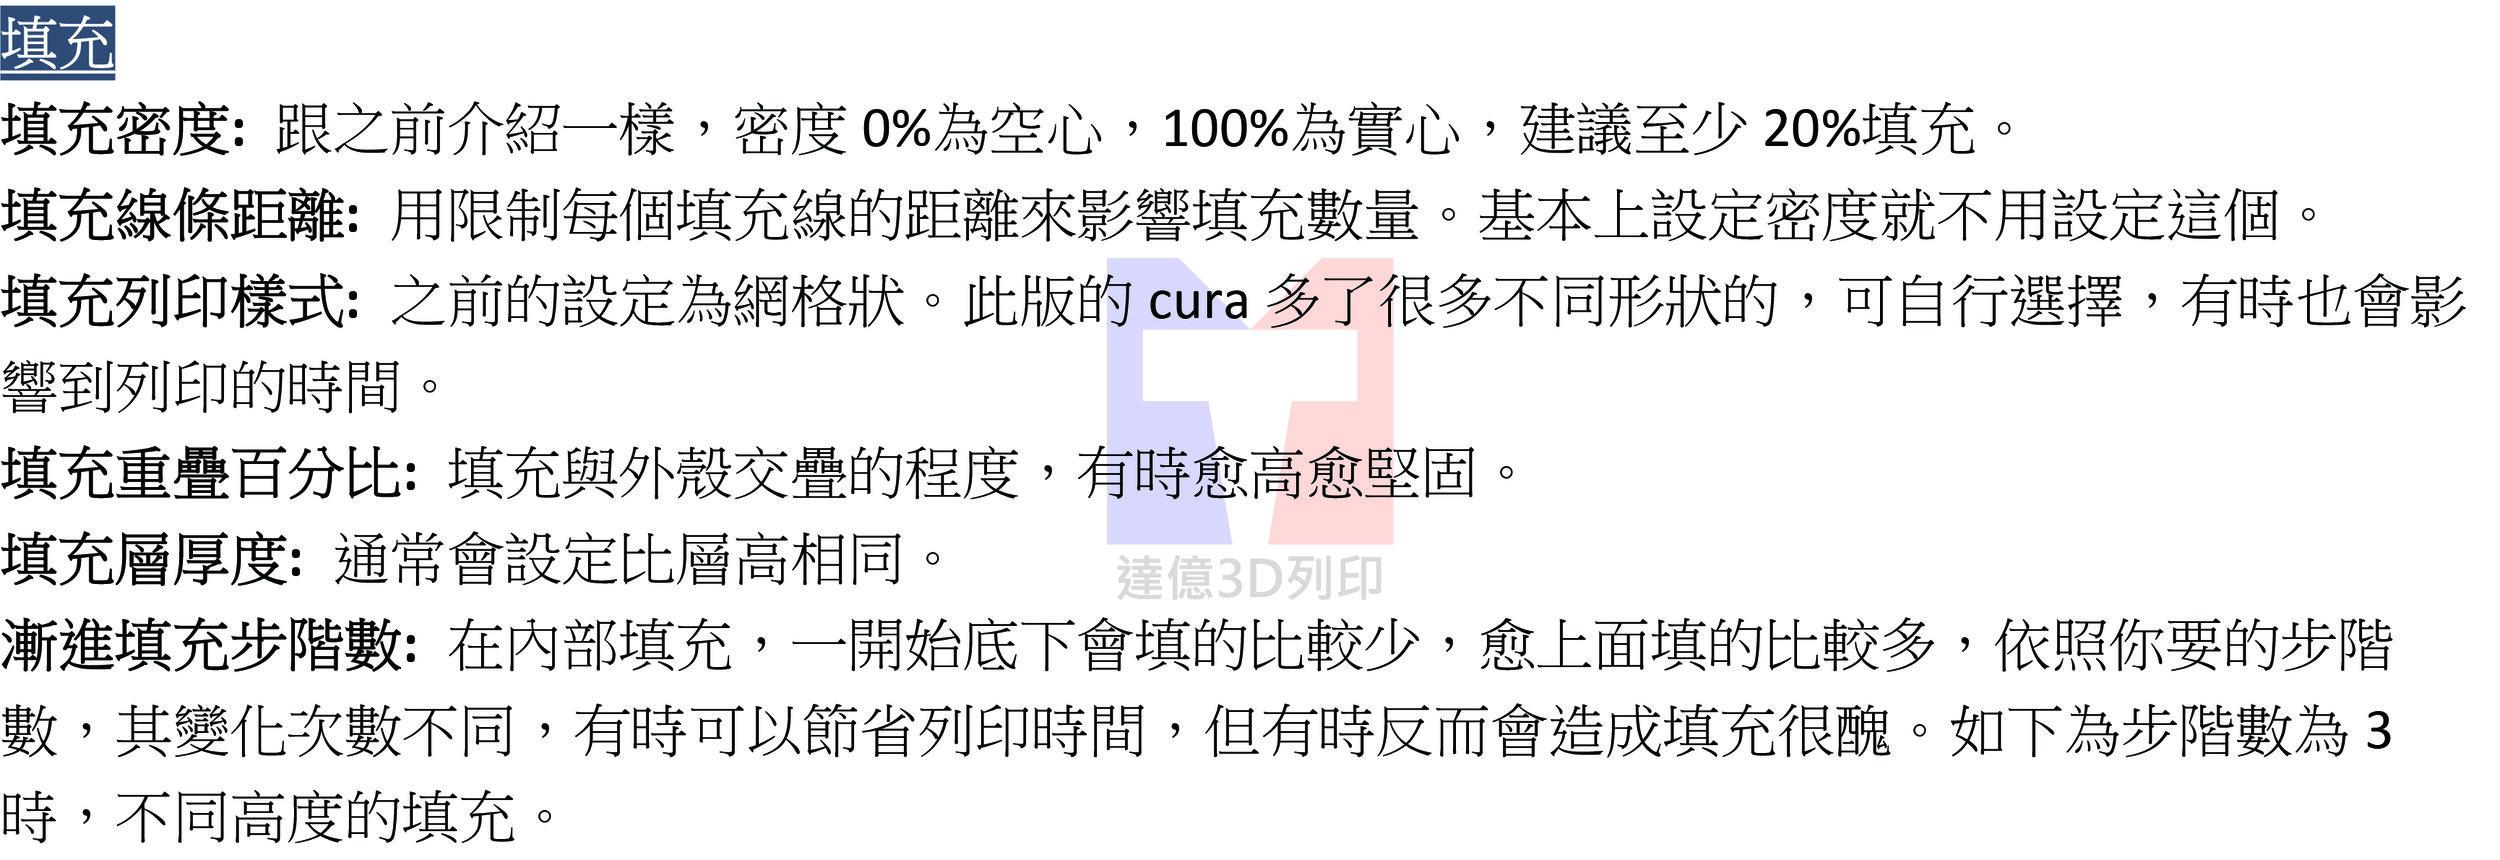 CURA設定3D列印機 填充.jpg